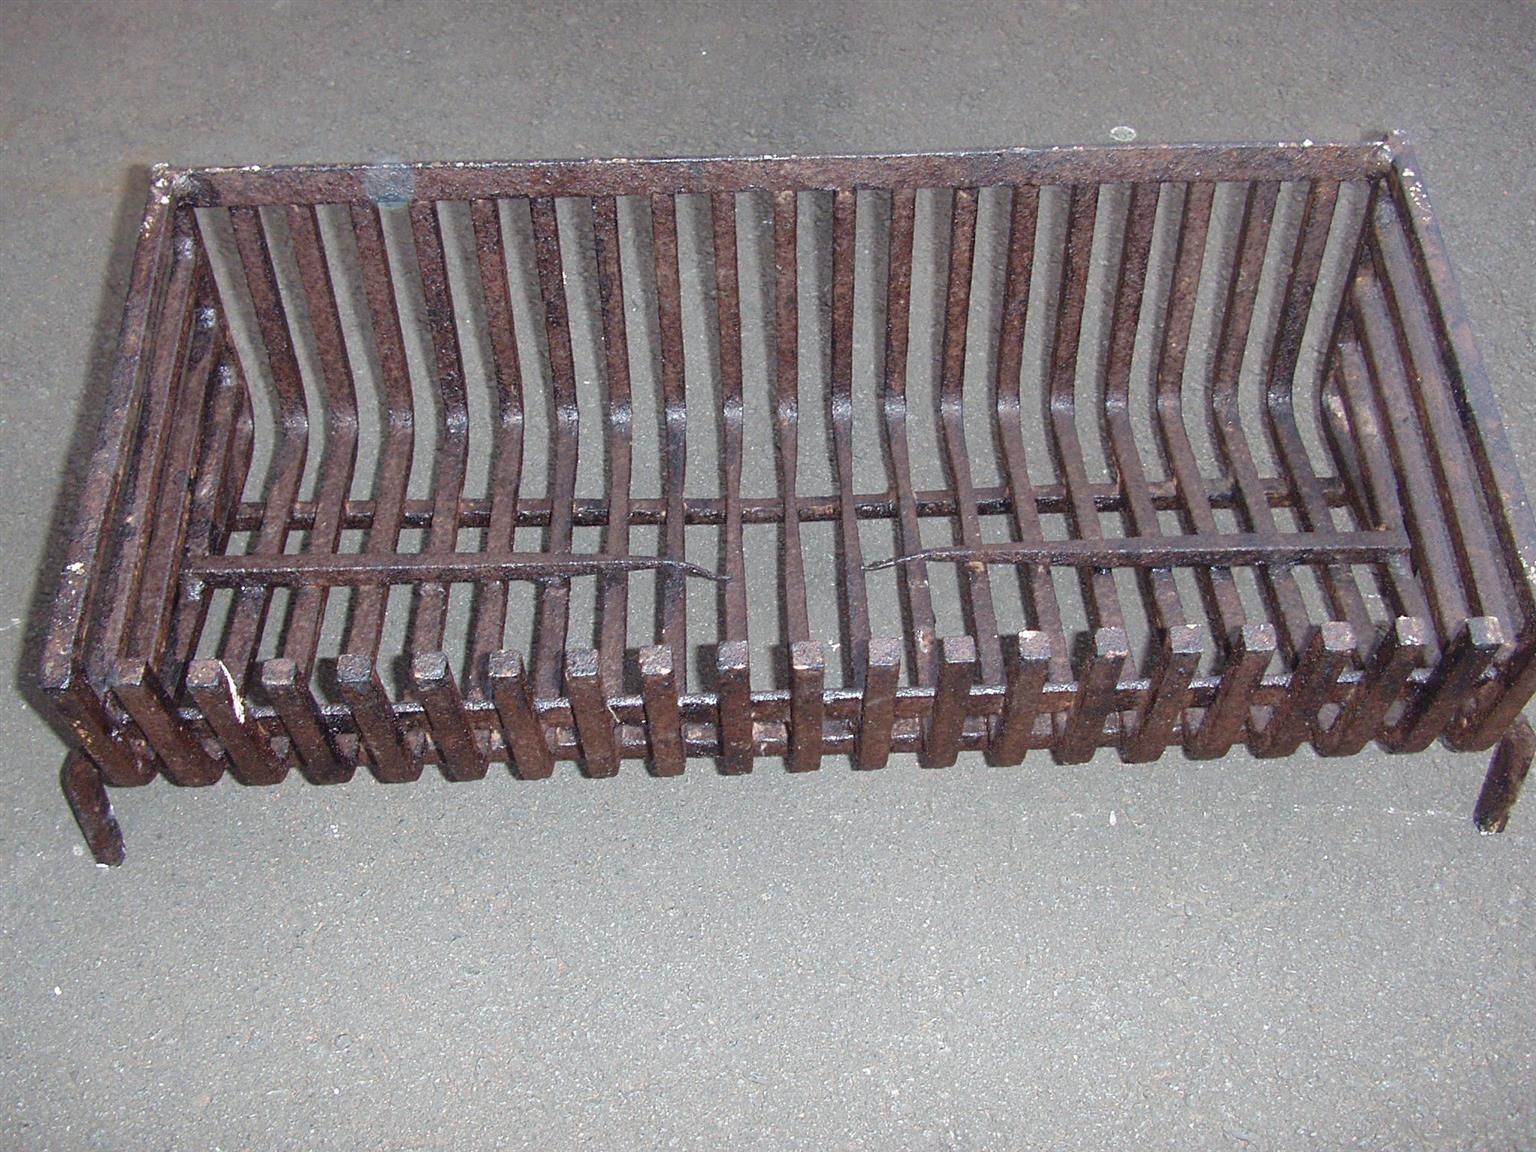 Fire Grate  - 60 x 30 x 25 cm